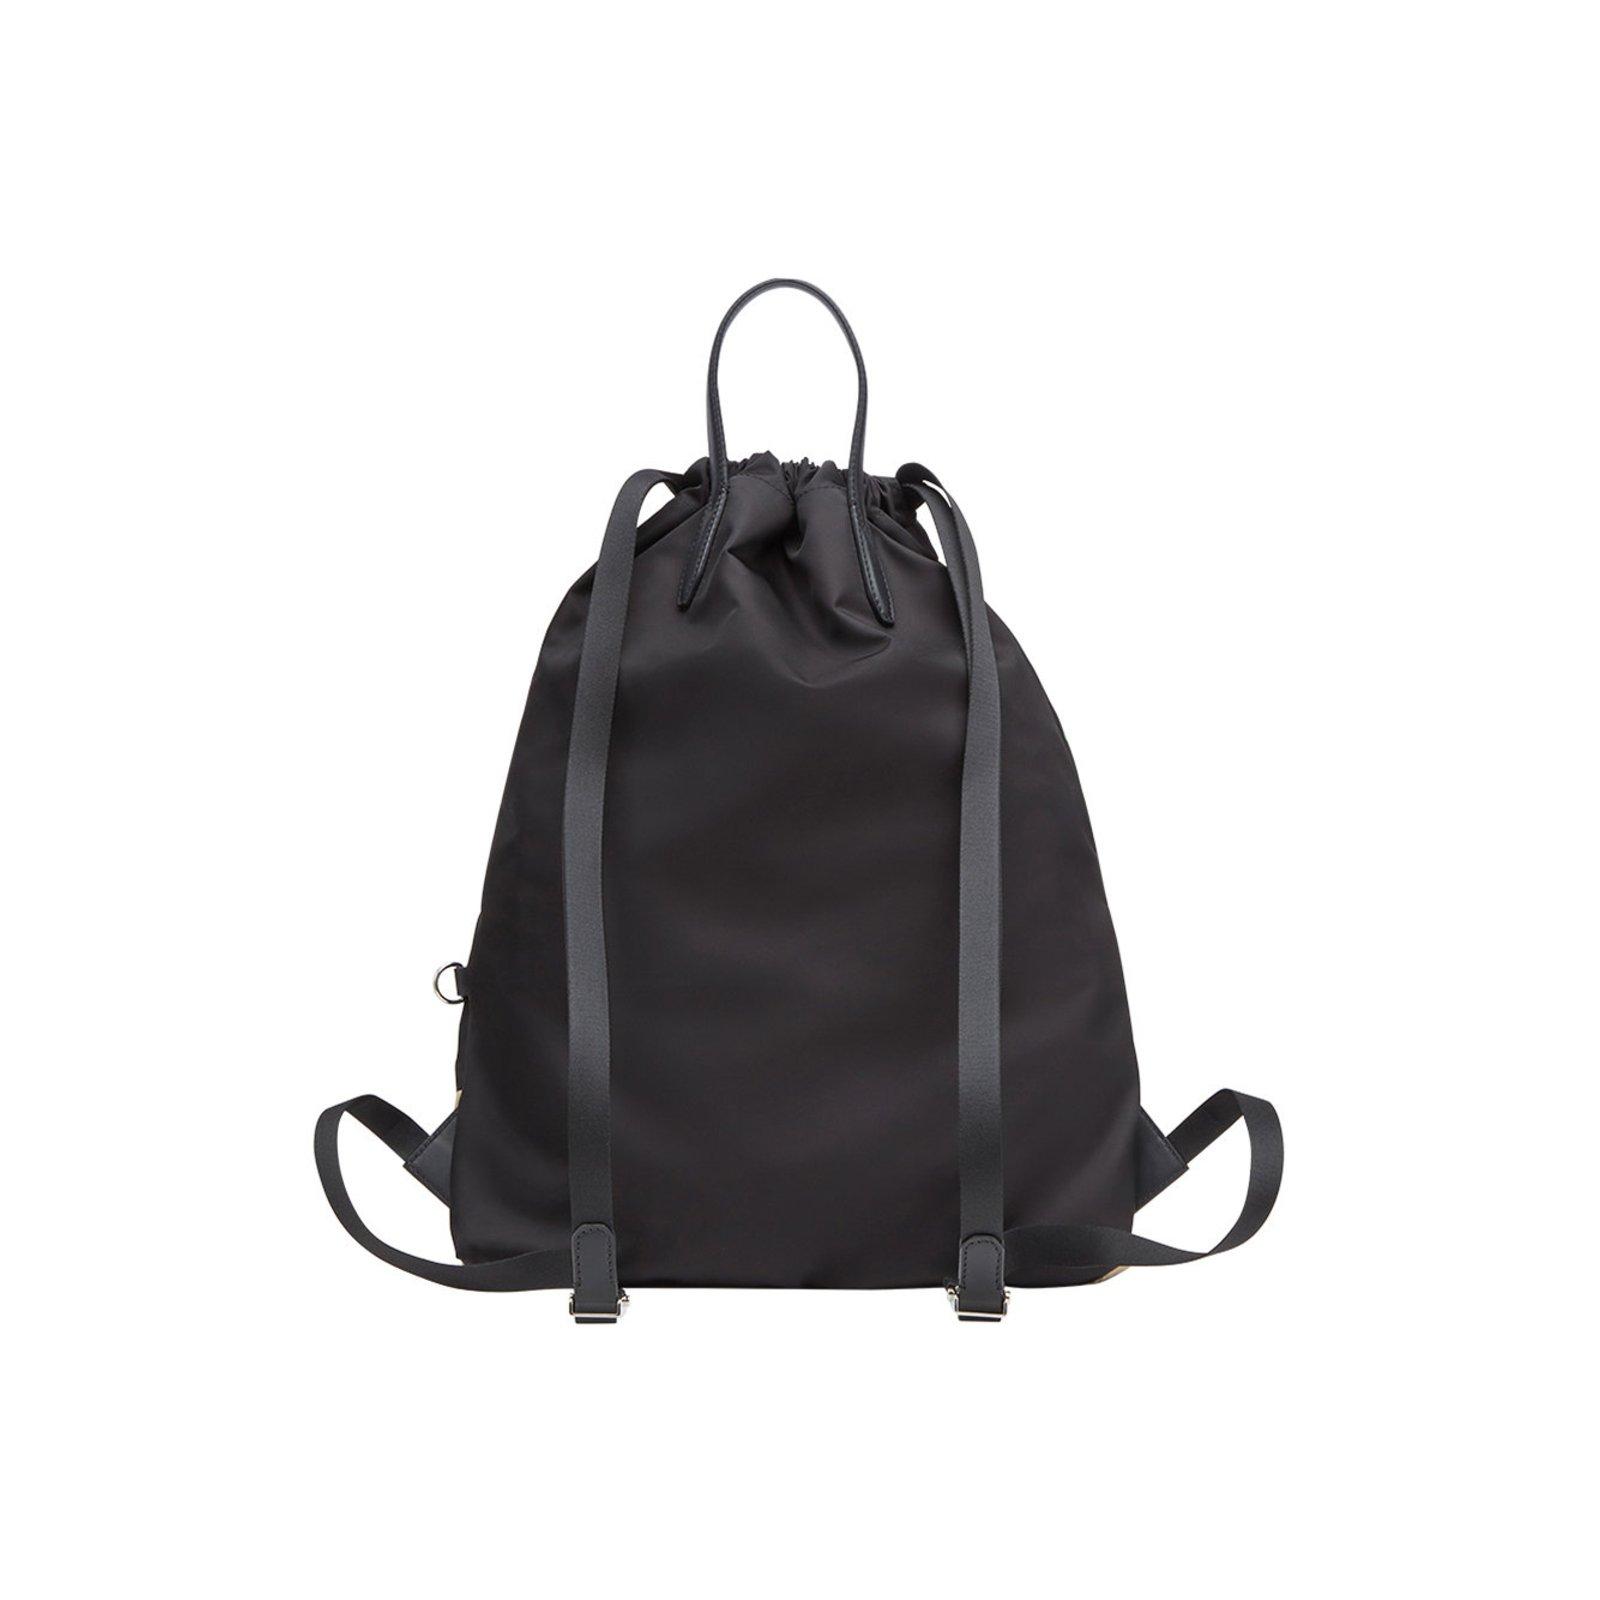 5a6535b8c10 Fendi Fendi backpack new Bags Briefcases nylon Black ref.72279 - Joli Closet